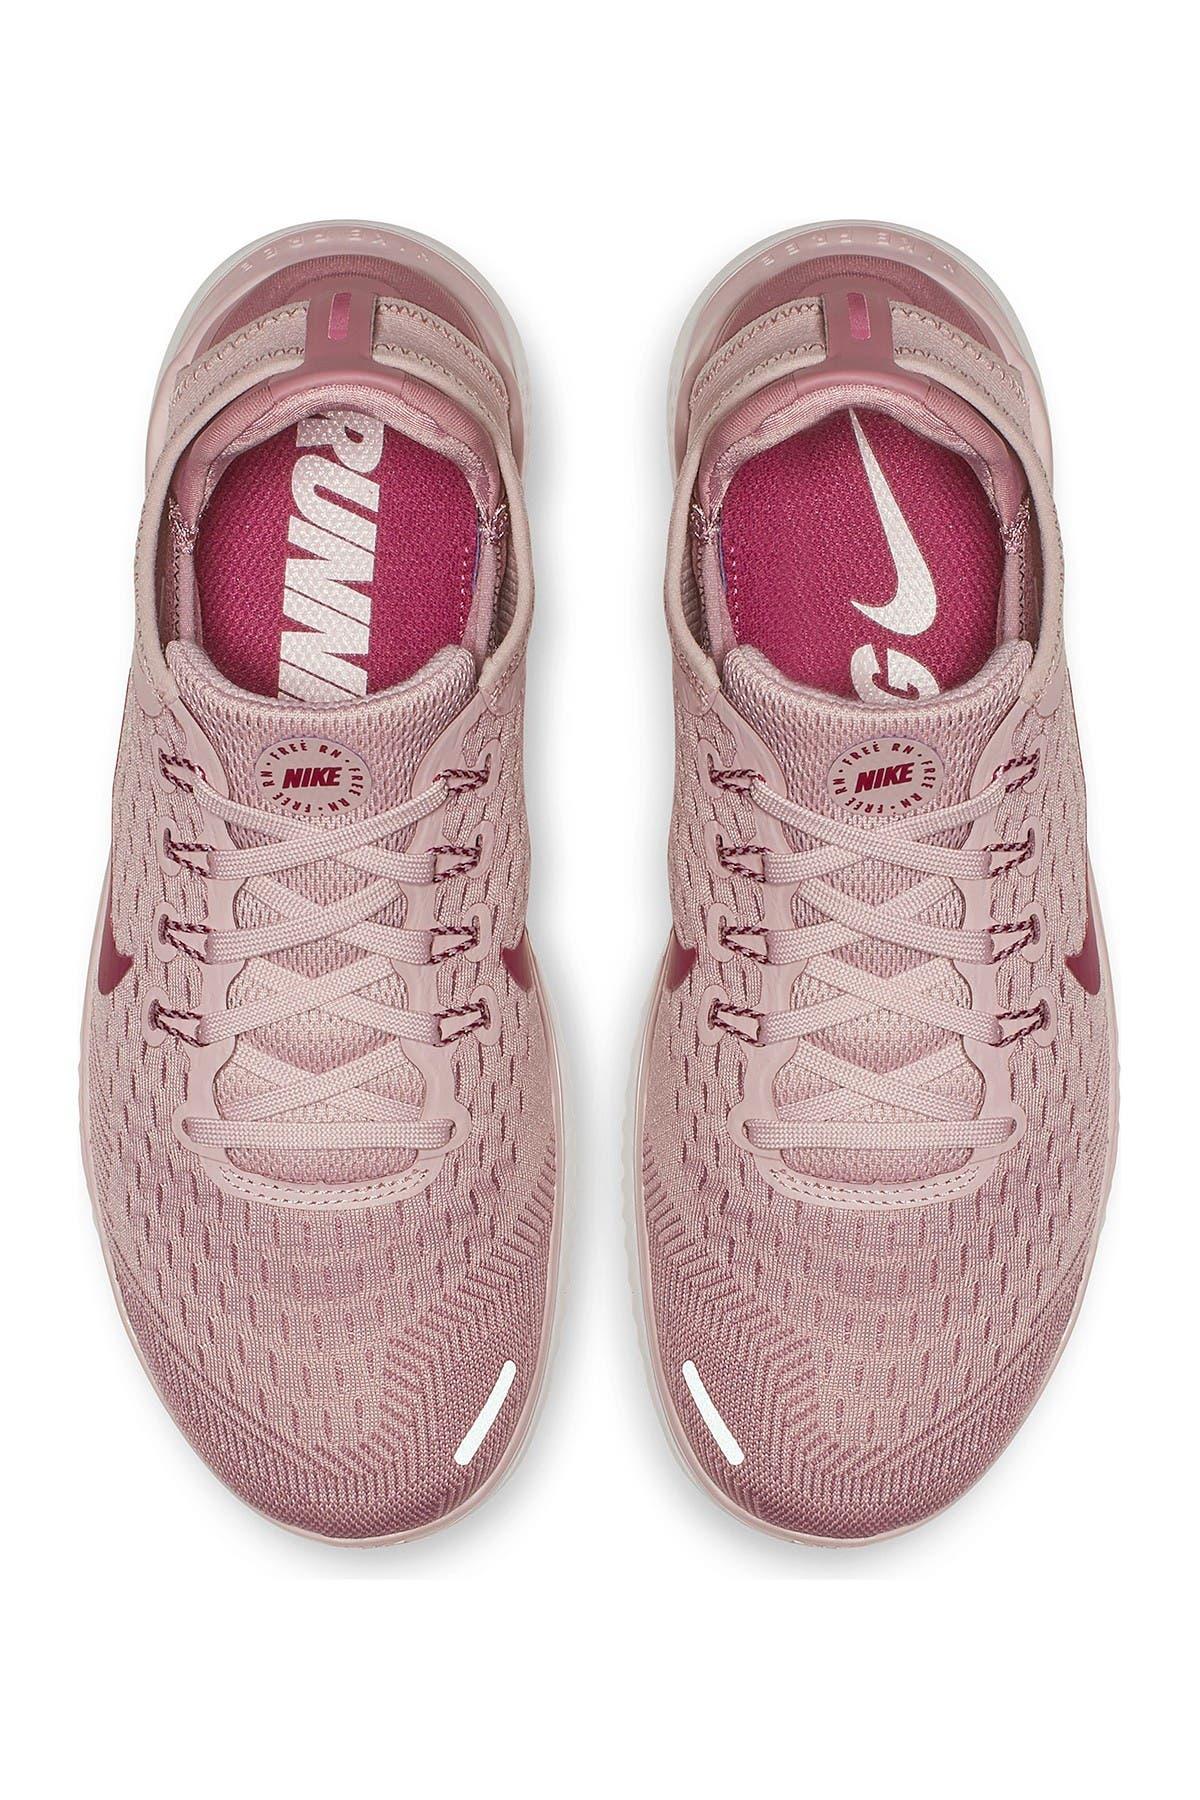 Nike | Free RN 2018 Running Sneaker